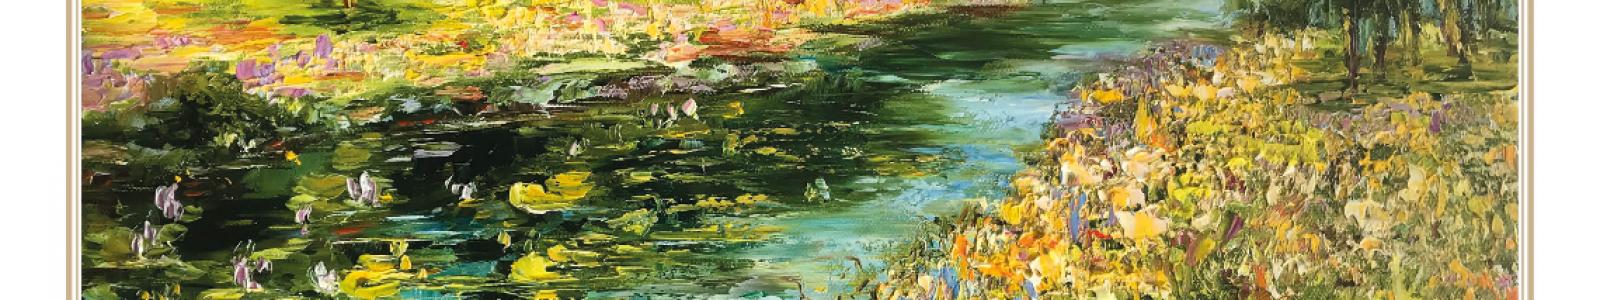 Gallery Painter Diana Malivani